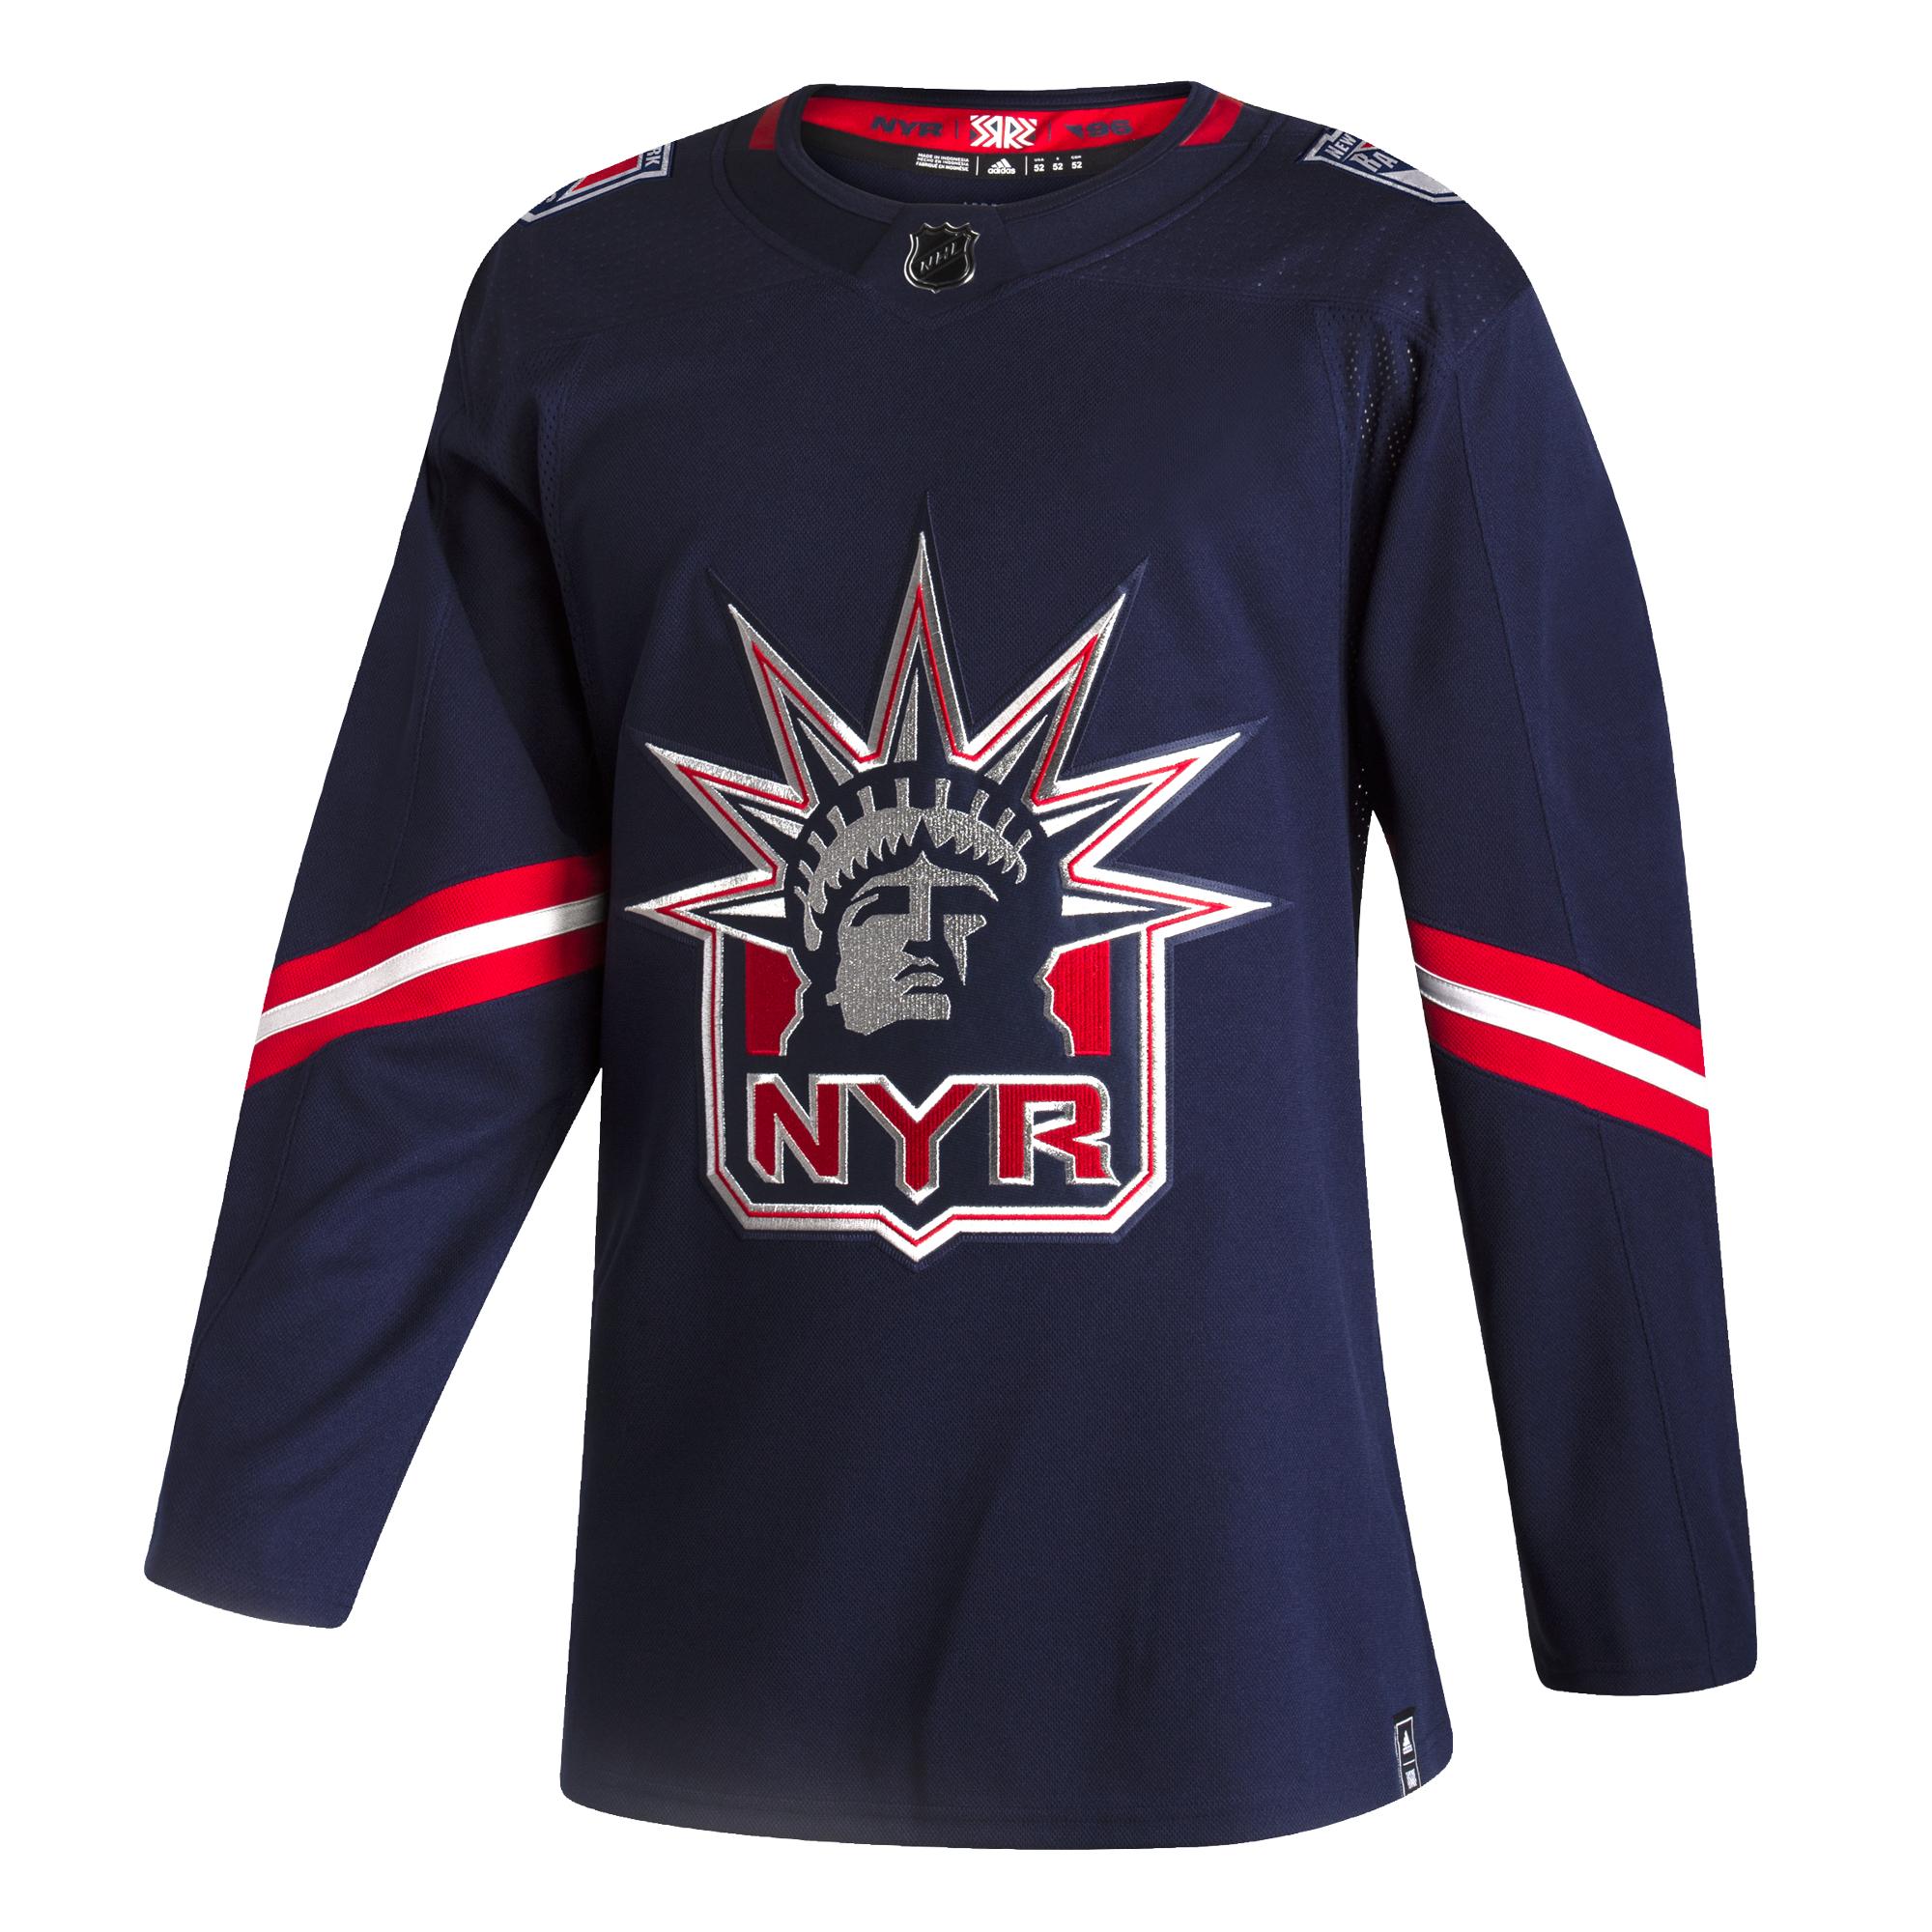 Men's NHL New York Rangers Adidas Blue 2020/21 Reverse Retro ...